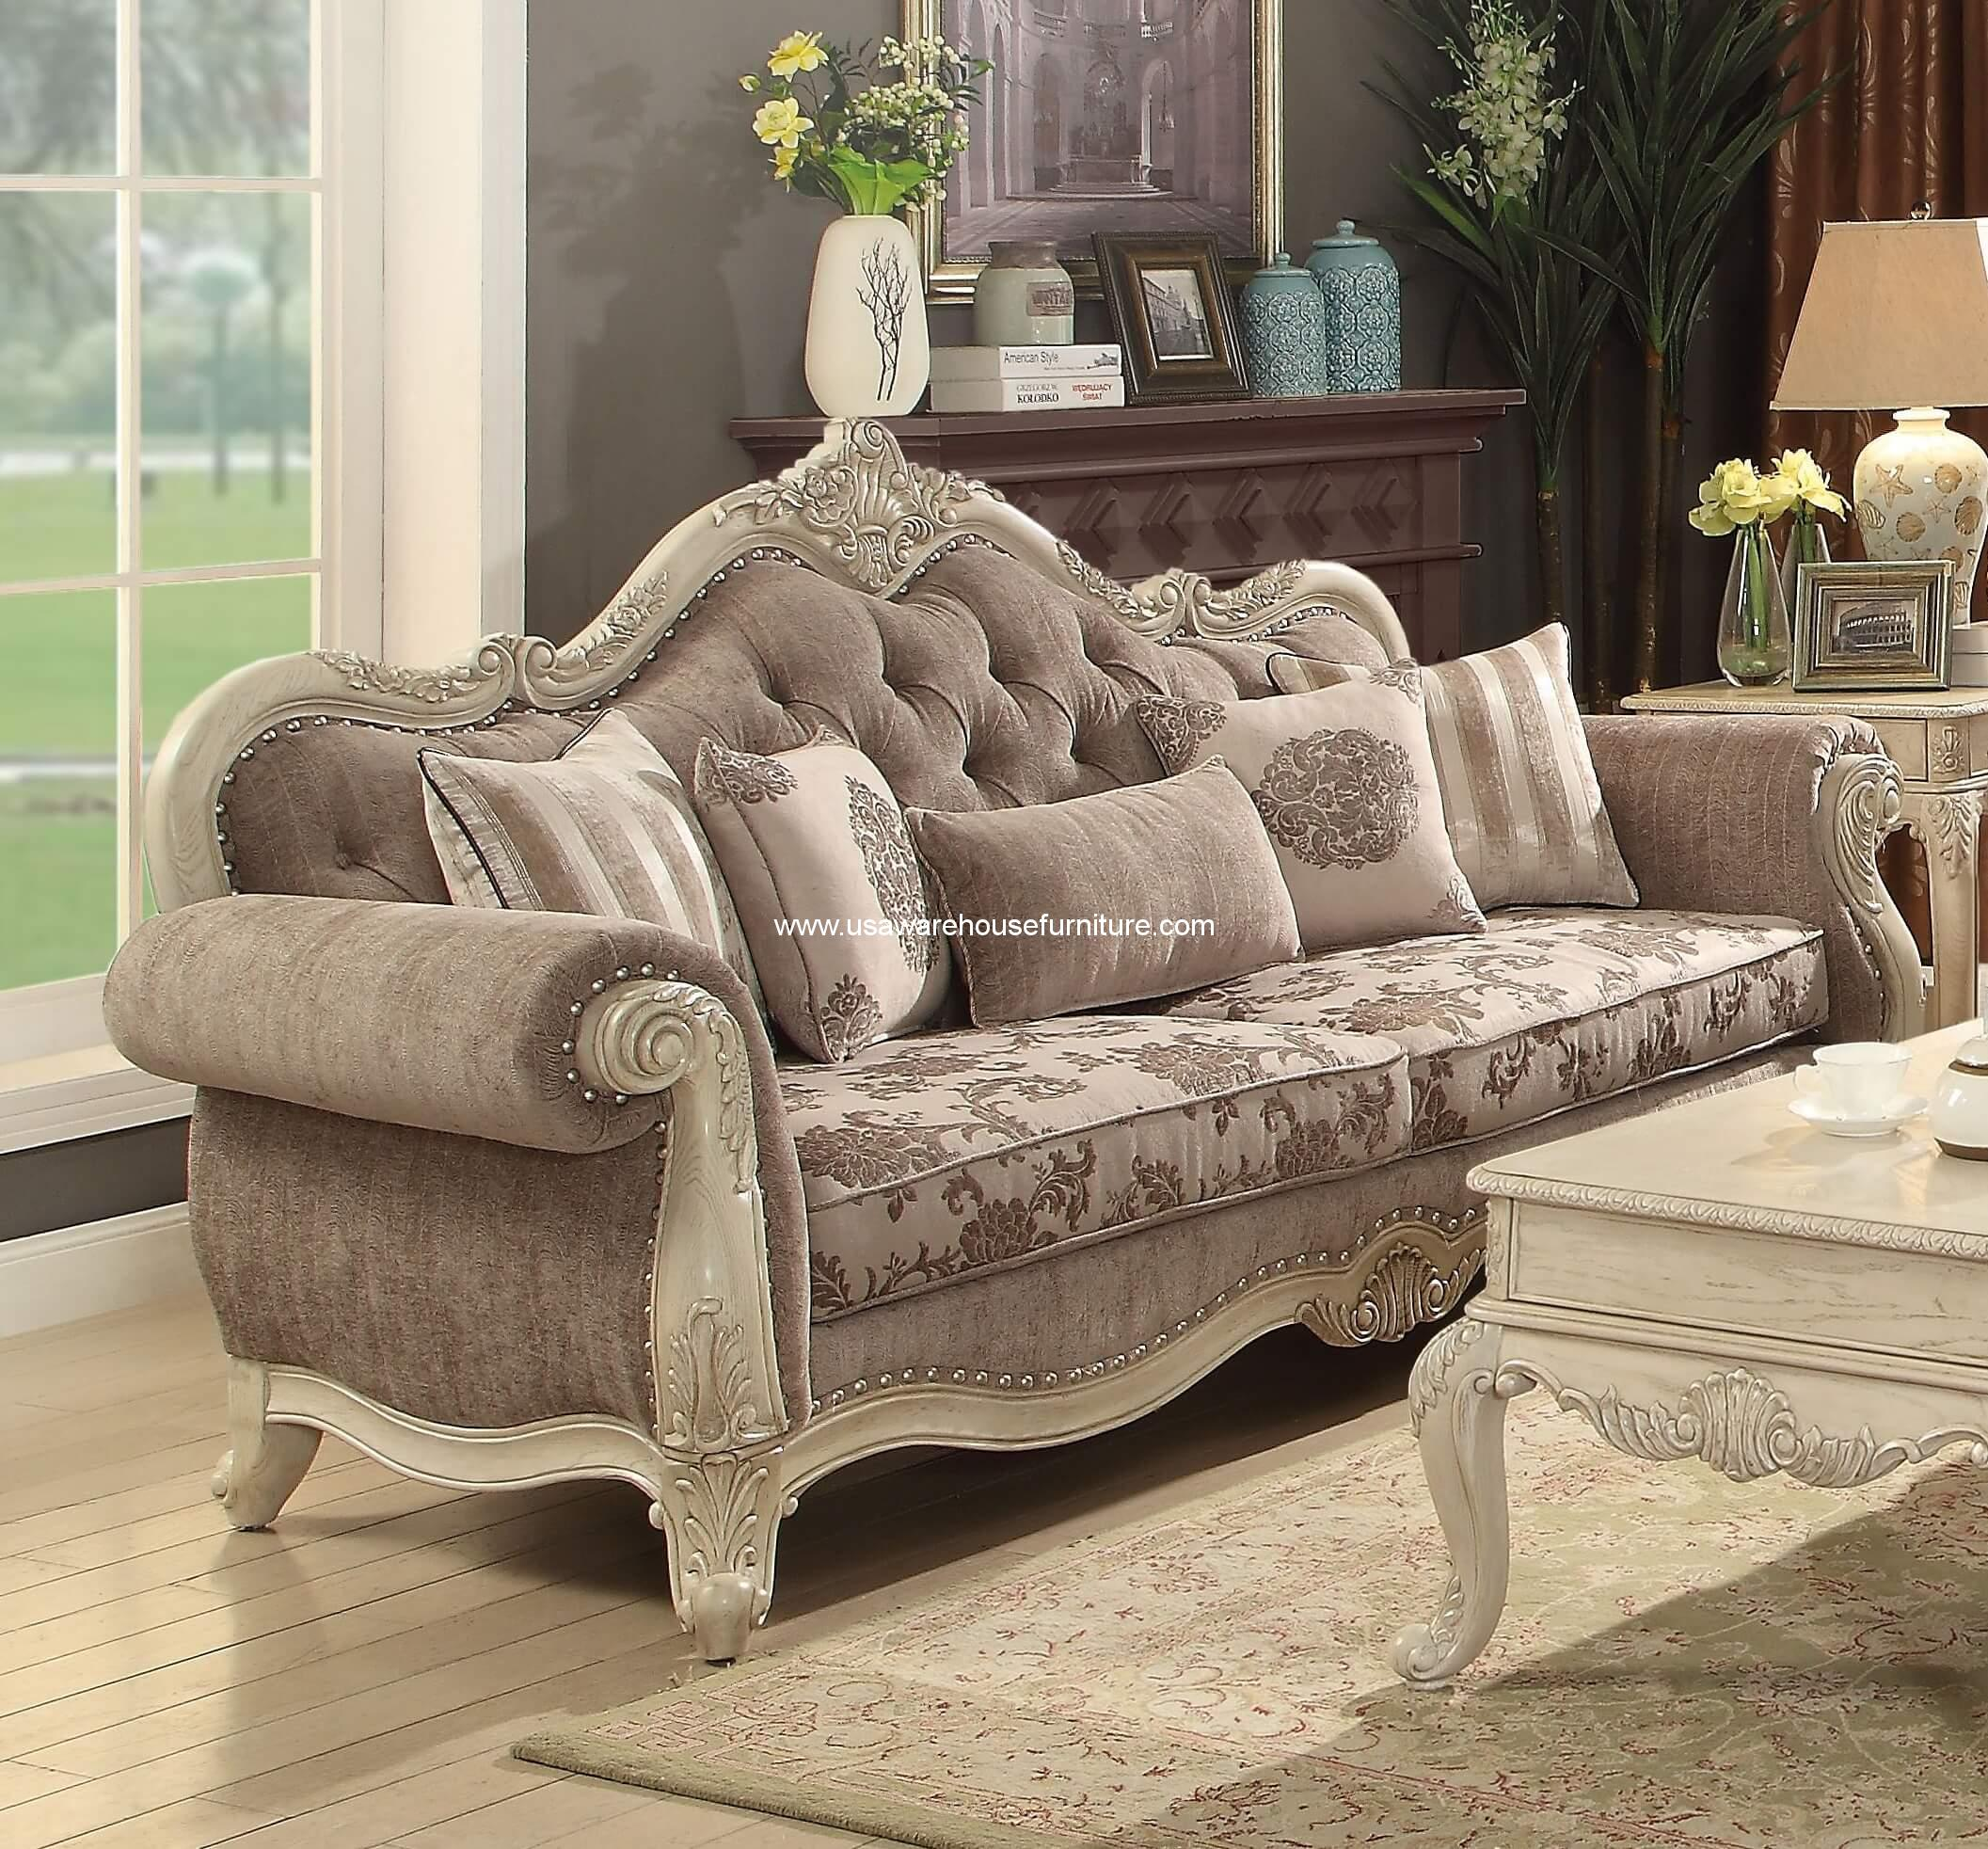 Ragenardus traditional sofa antique white finish usa for Traditional sofas